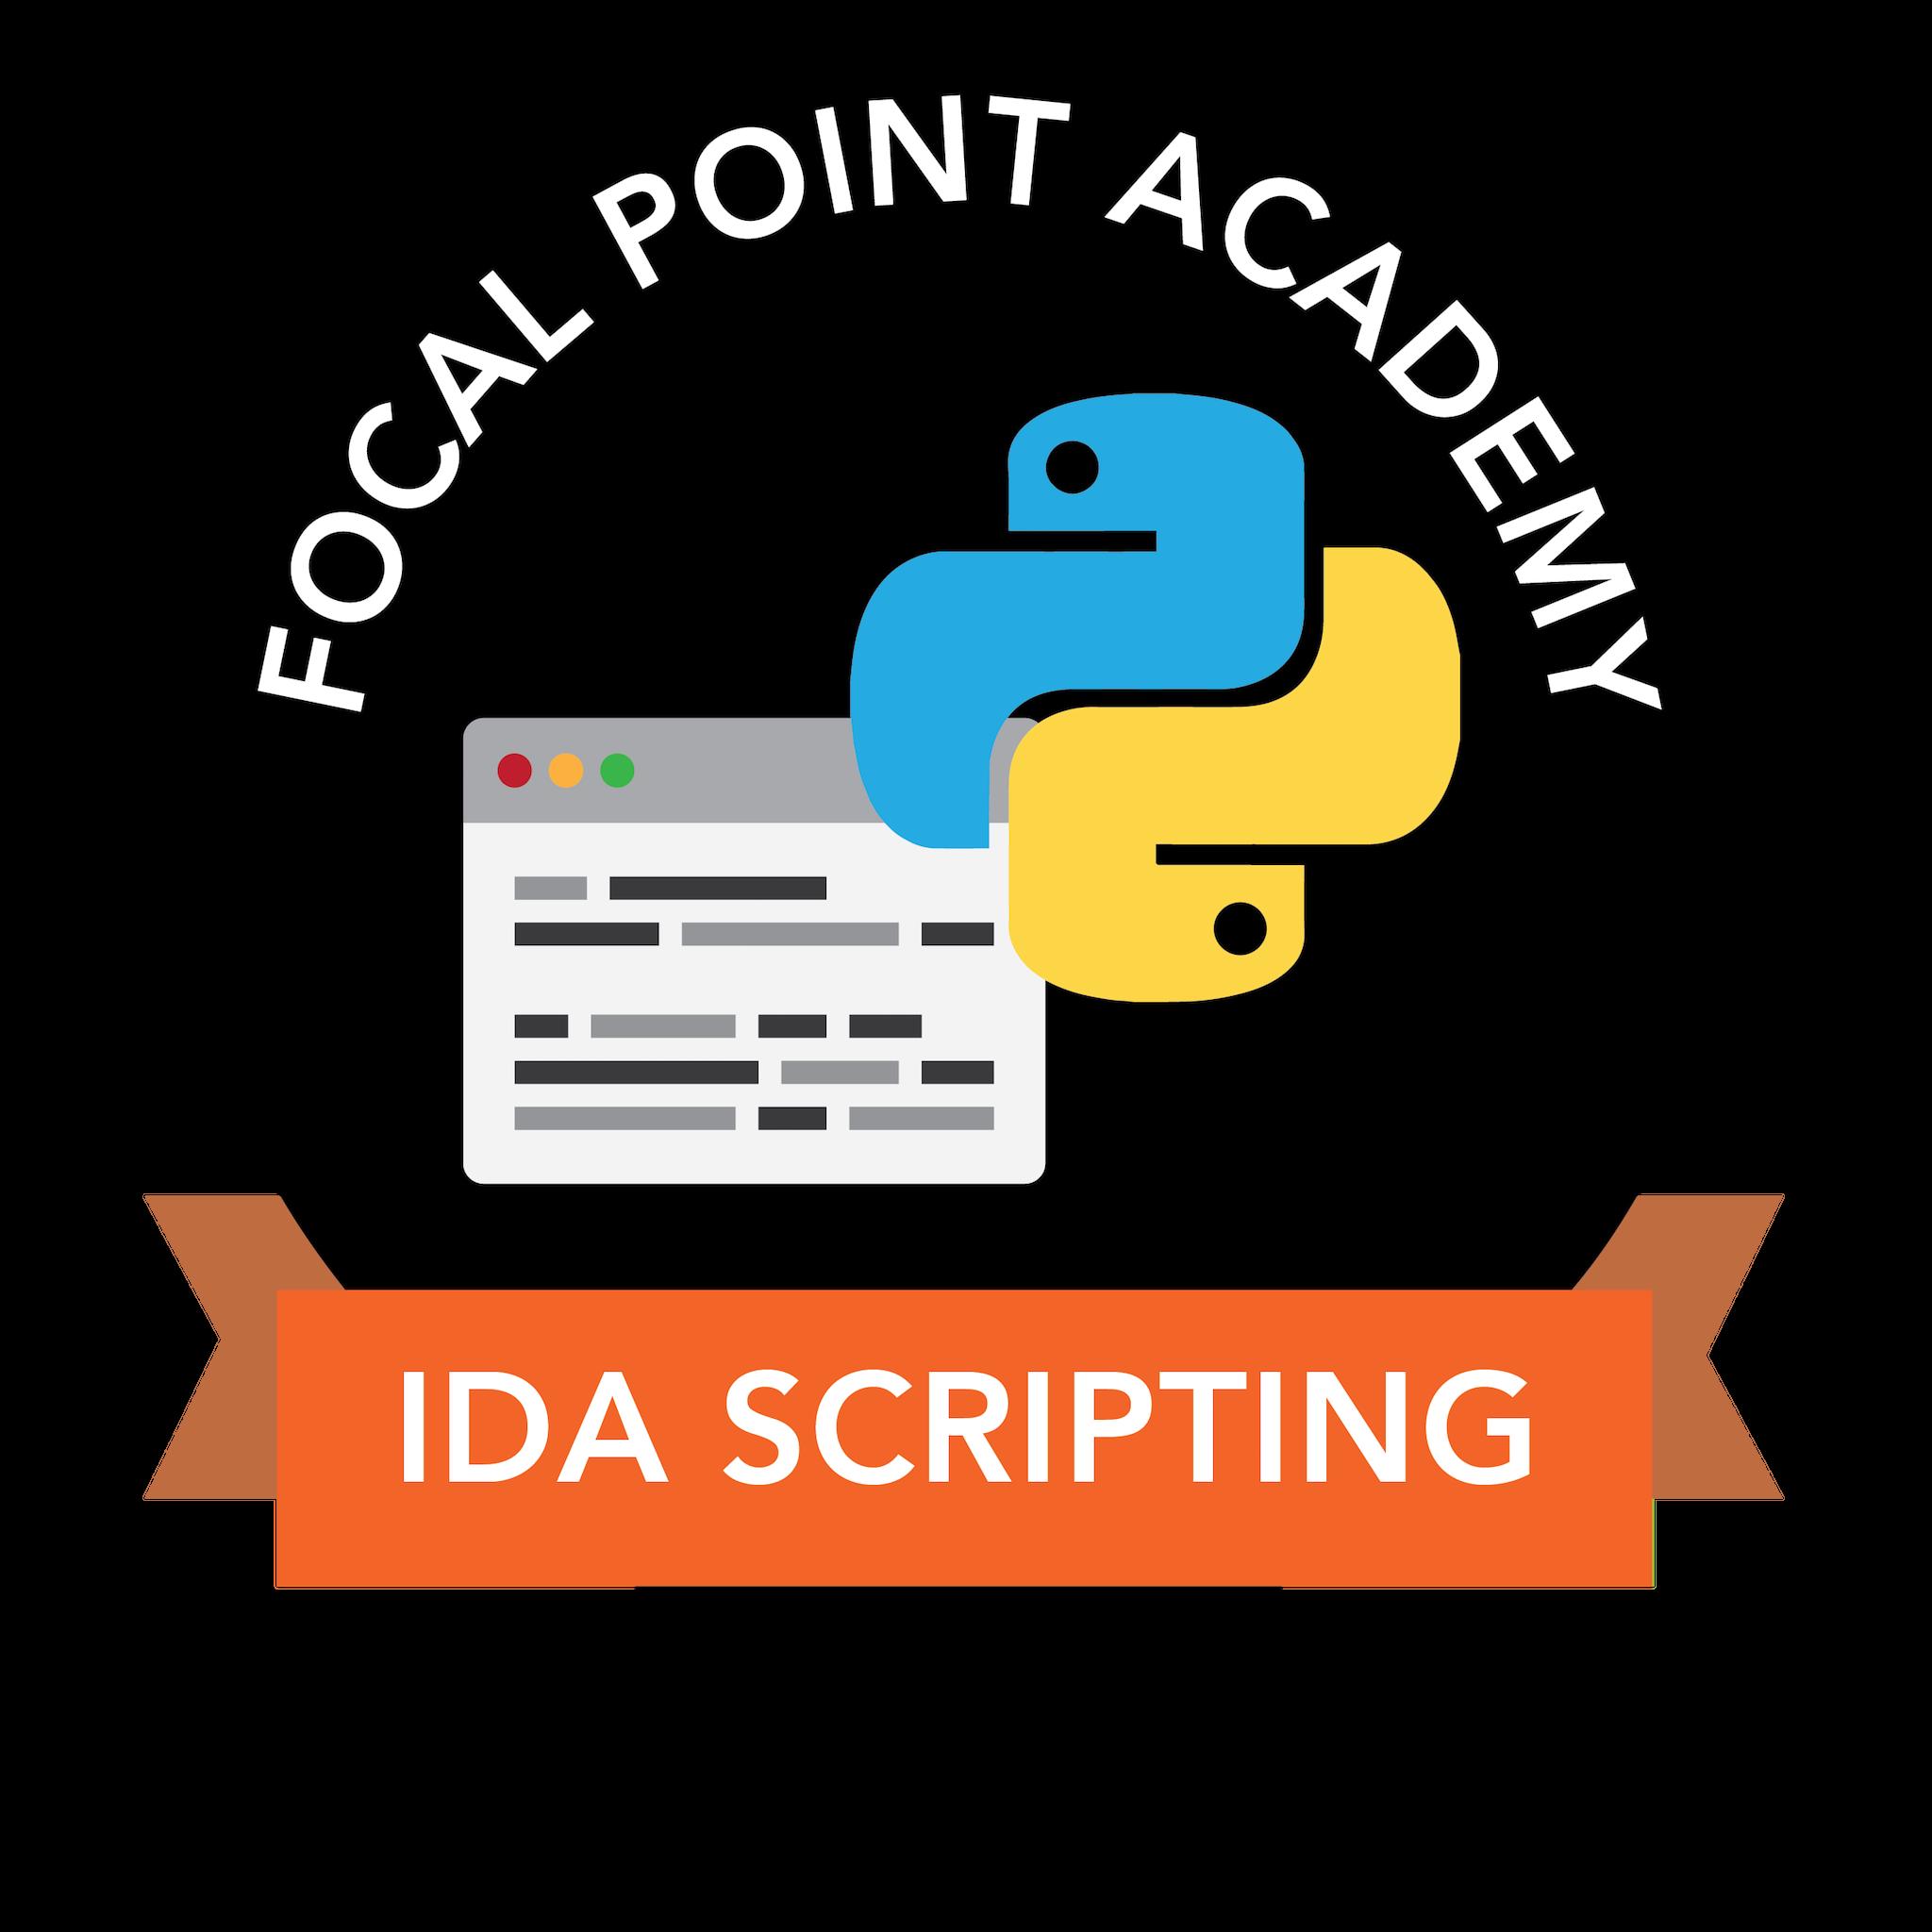 Scripting IDA with Python